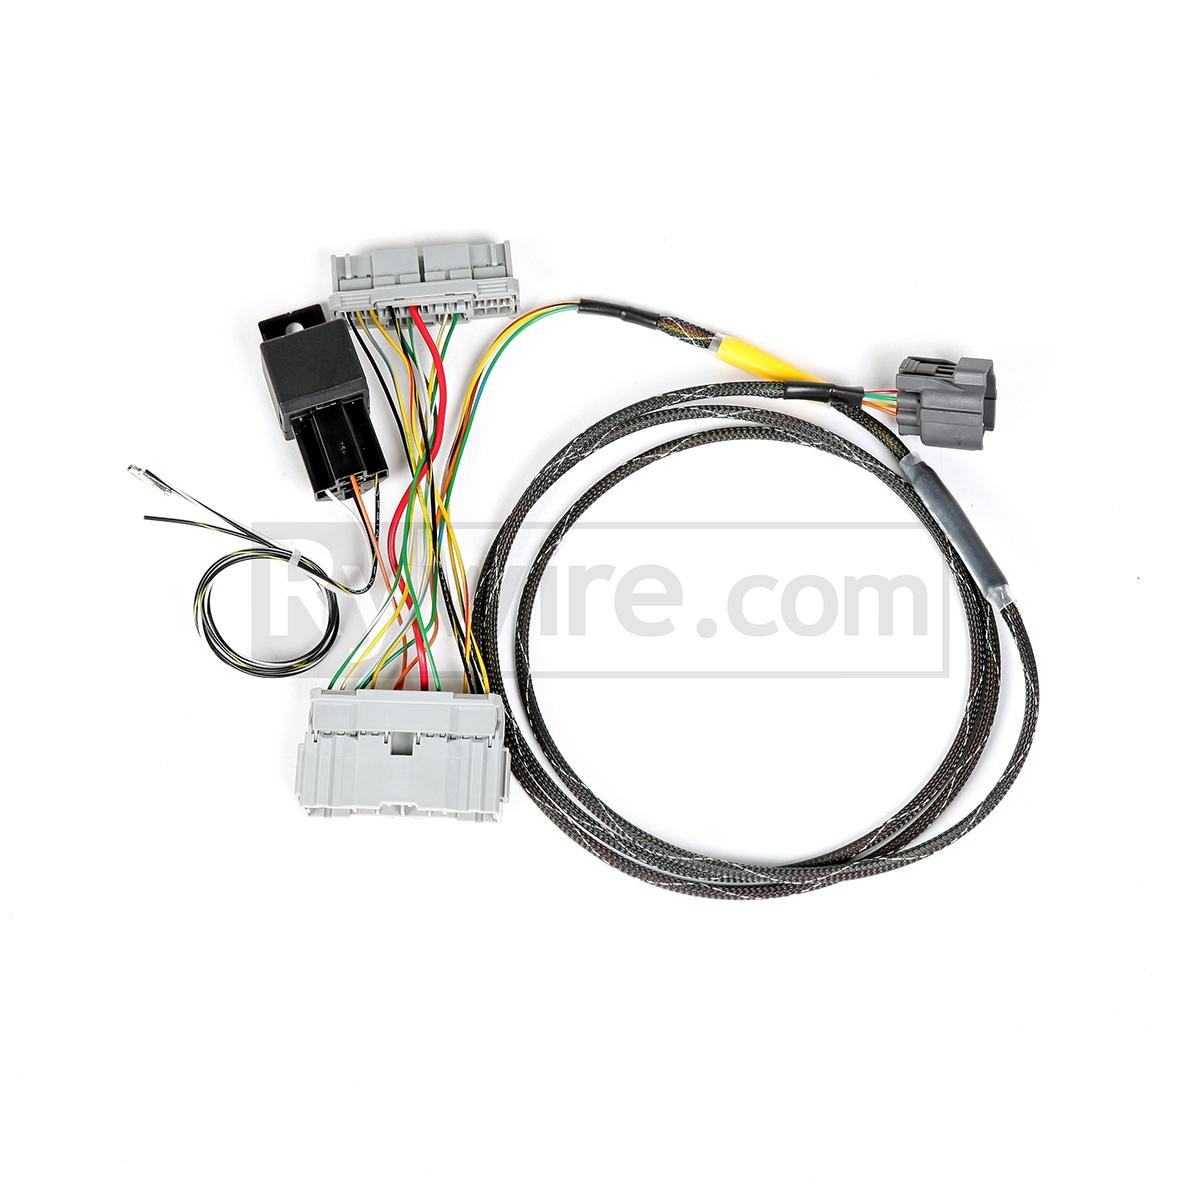 medium resolution of rywire k series chassis adapter 1995 acura integra wiring harness 94 integra engine harness diagram